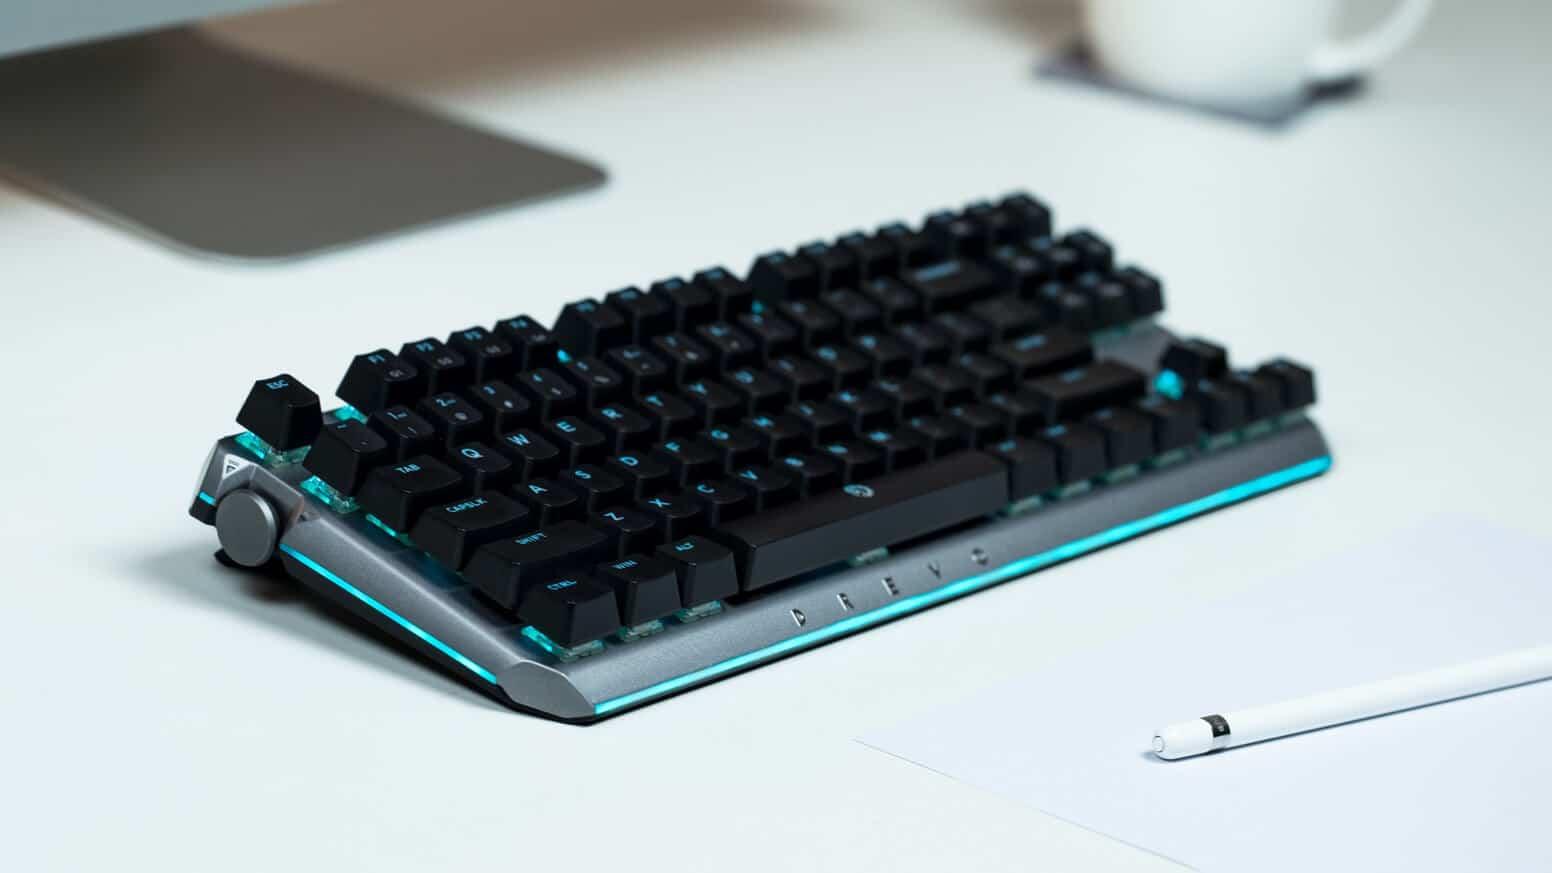 drevo blademaster keyboard